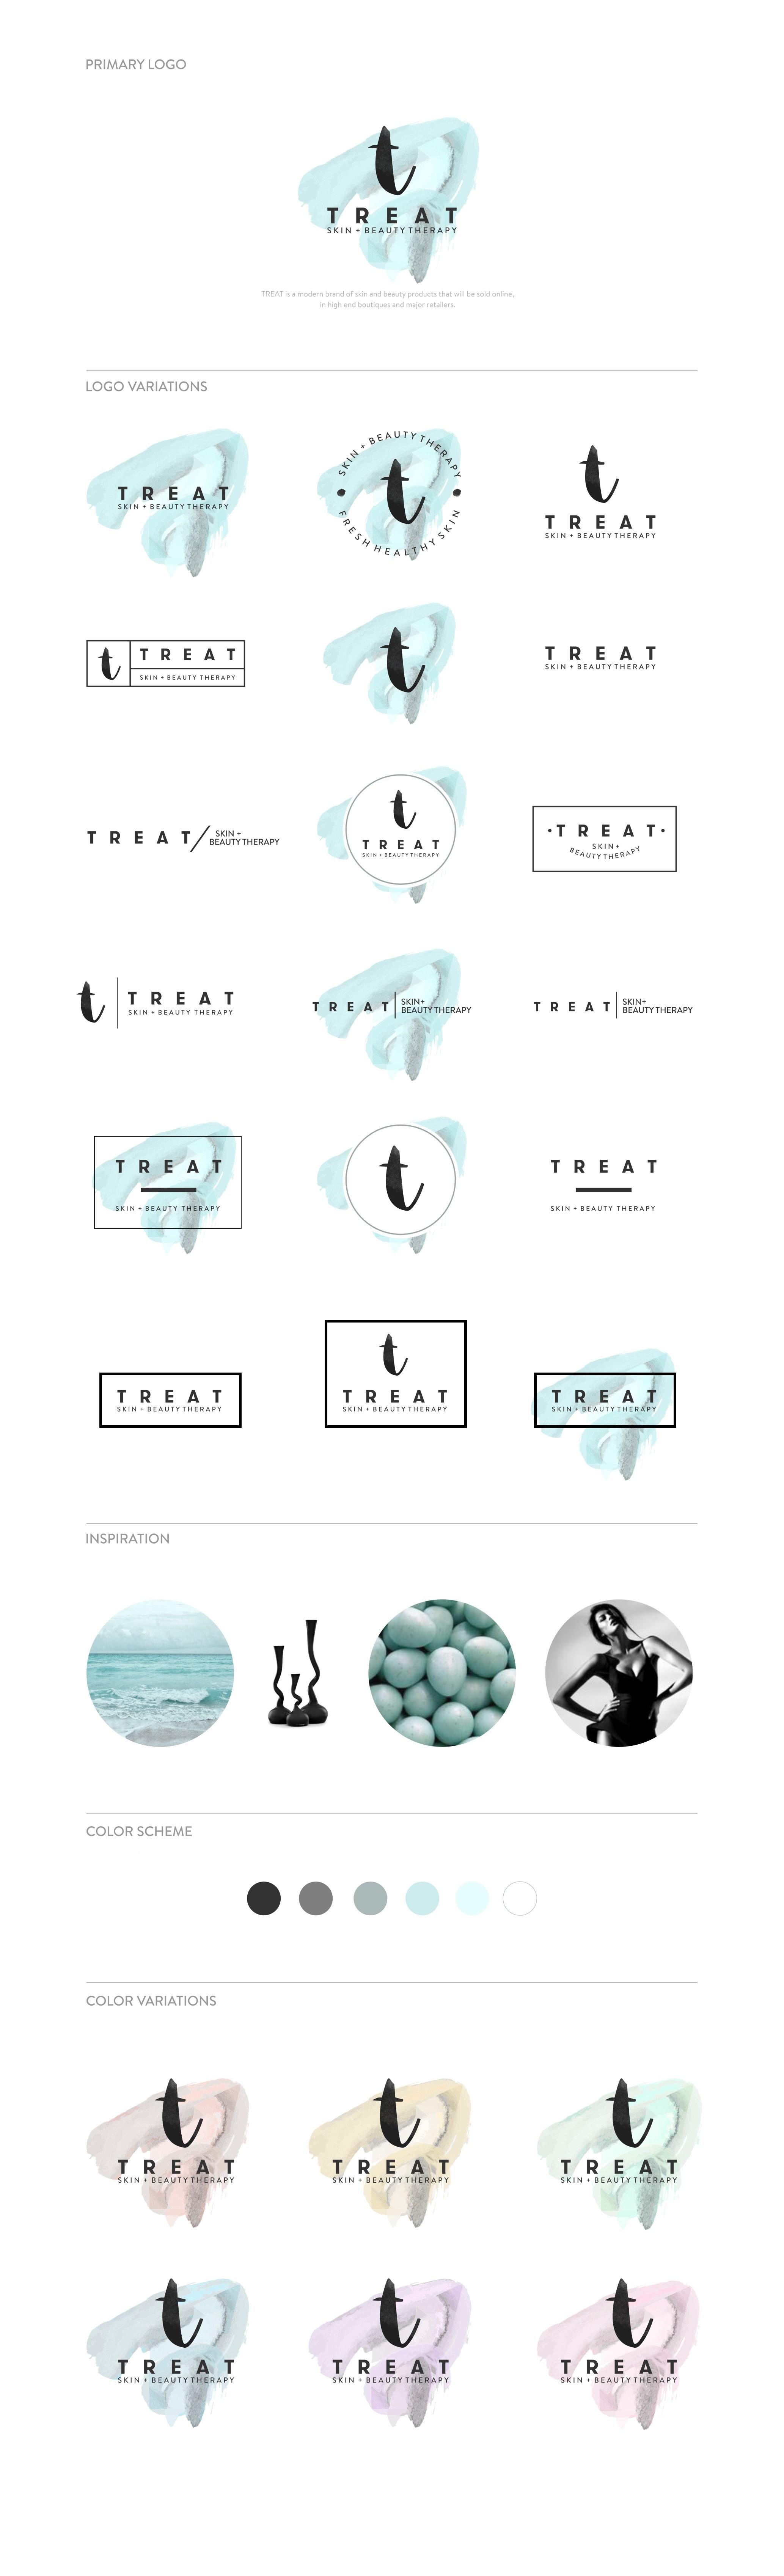 Fresh Modern Luxury Skincare Brand needs CREATIVE eye catching logo & supporting elements